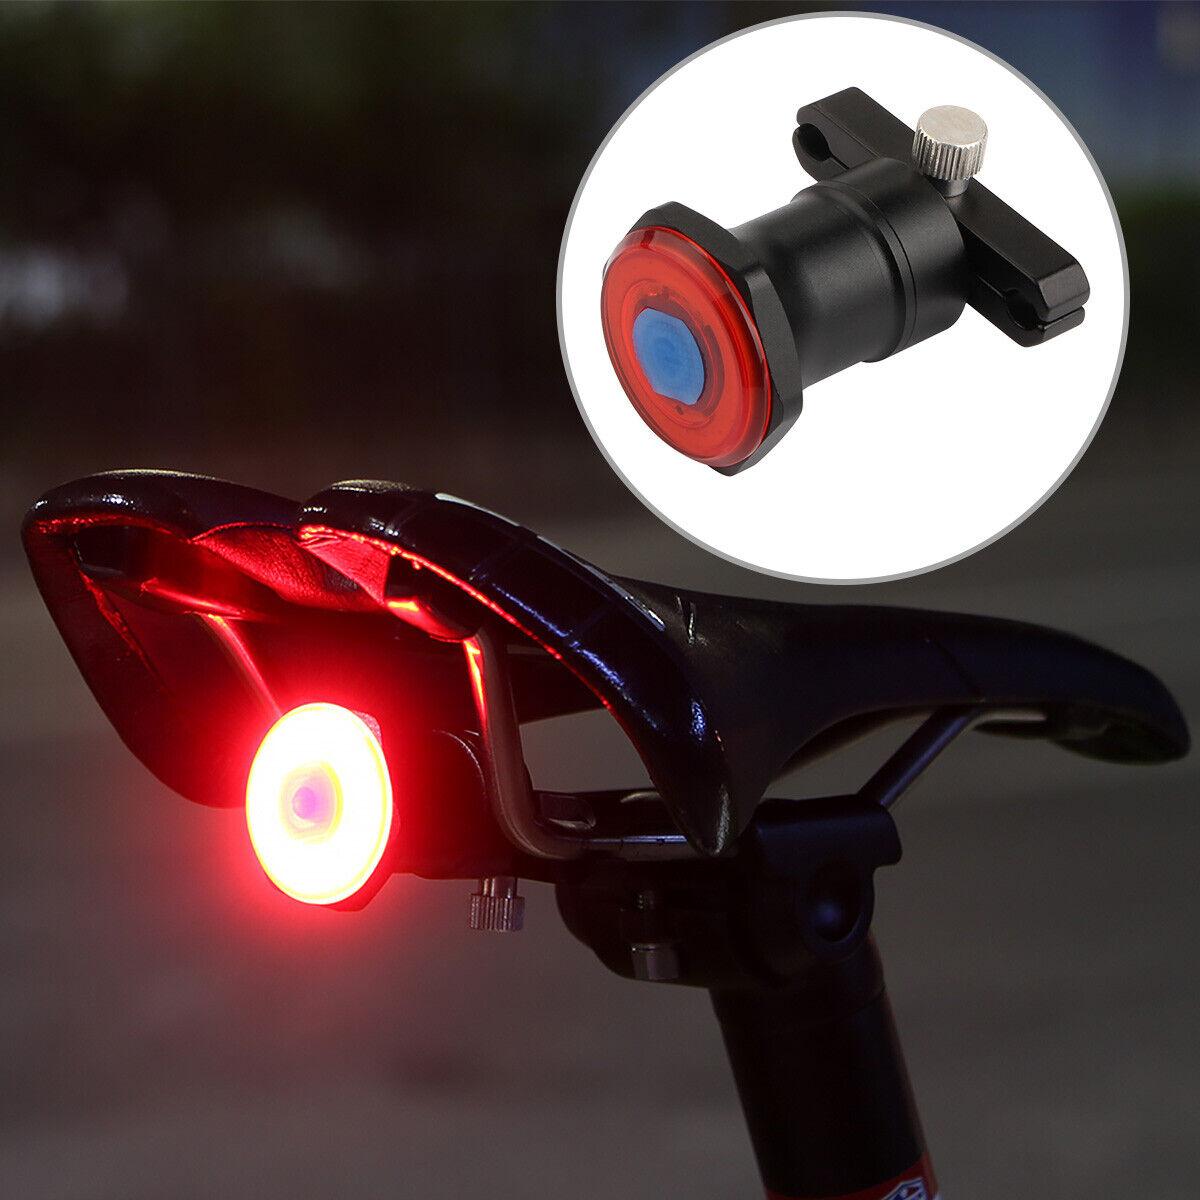 Led Fahrrad Rucklicht Bike Licht Akku Leuchte Sattel 100lm Alu Rennrad Mtb City Ebay